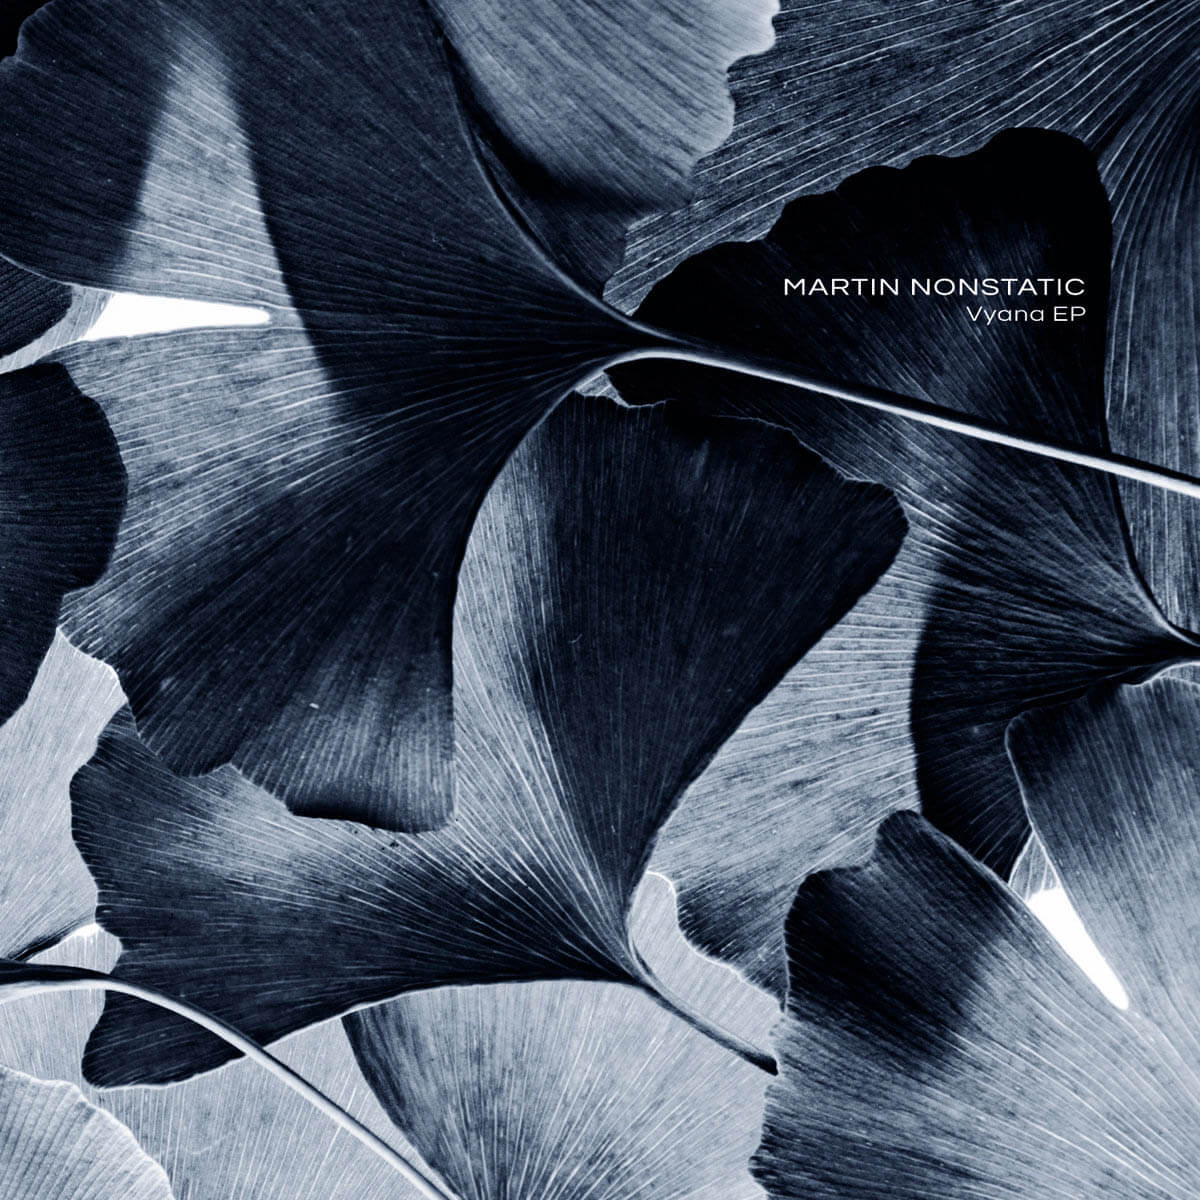 martin nonstatic vyana vinyl ep